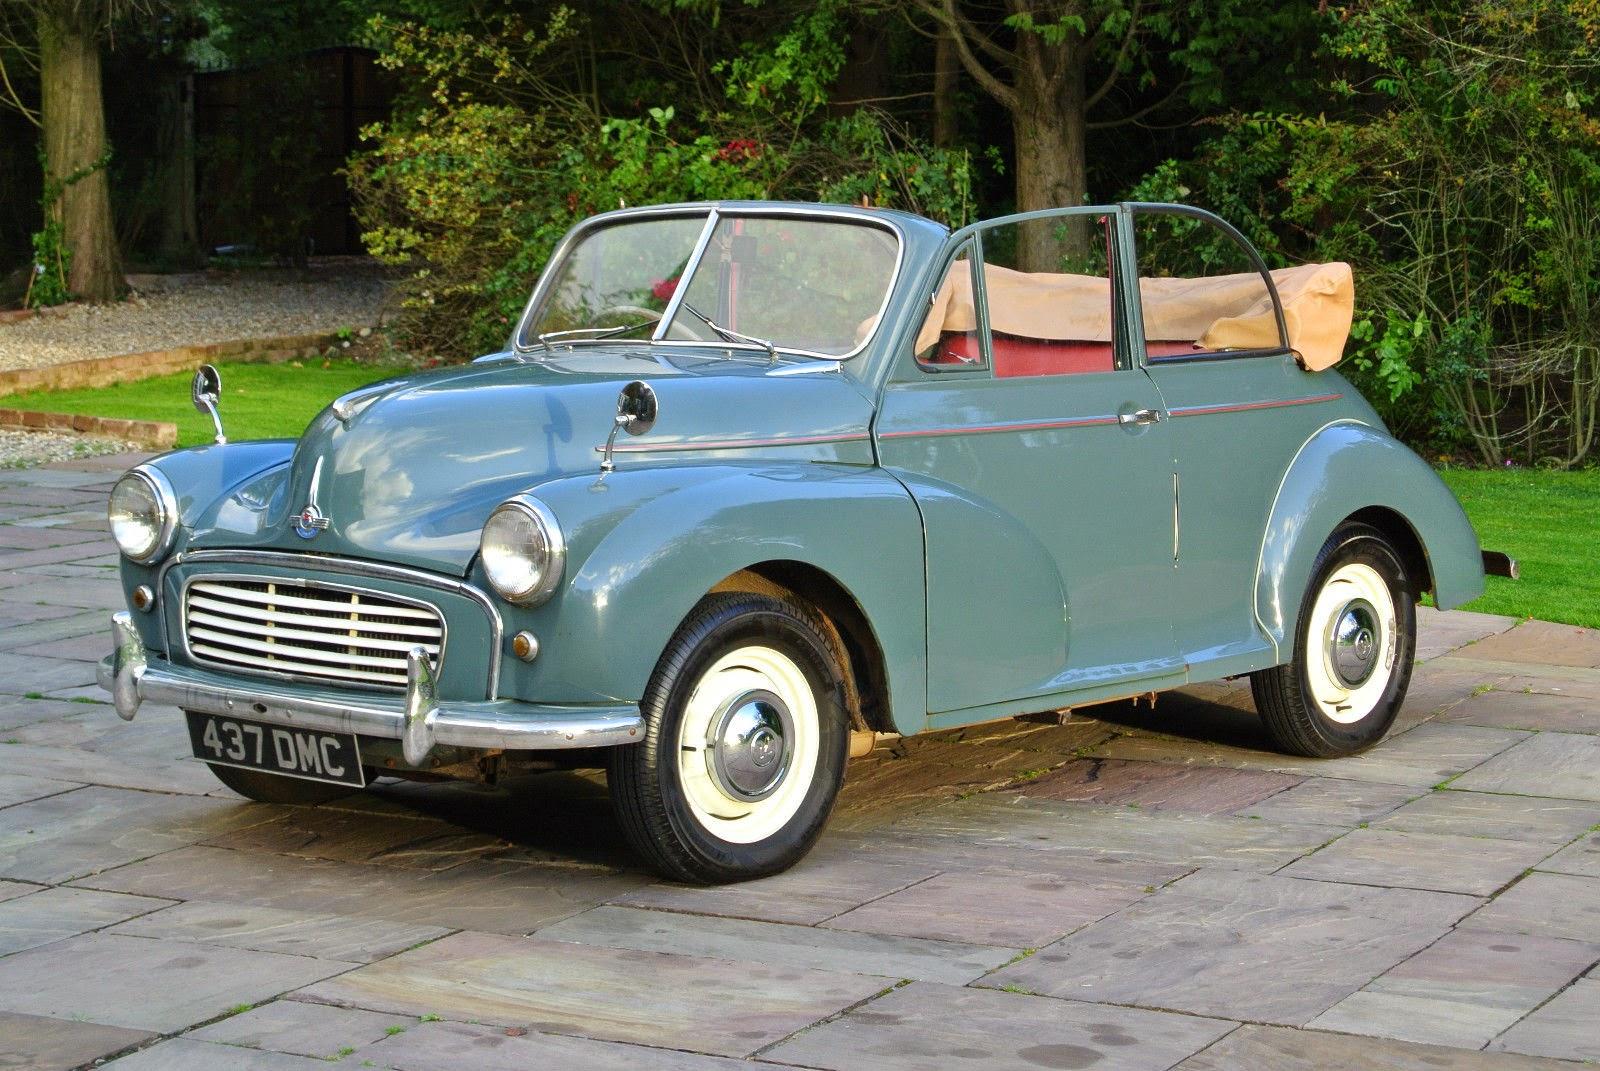 1955 Morris Minor Convertible | Auto Restorationice